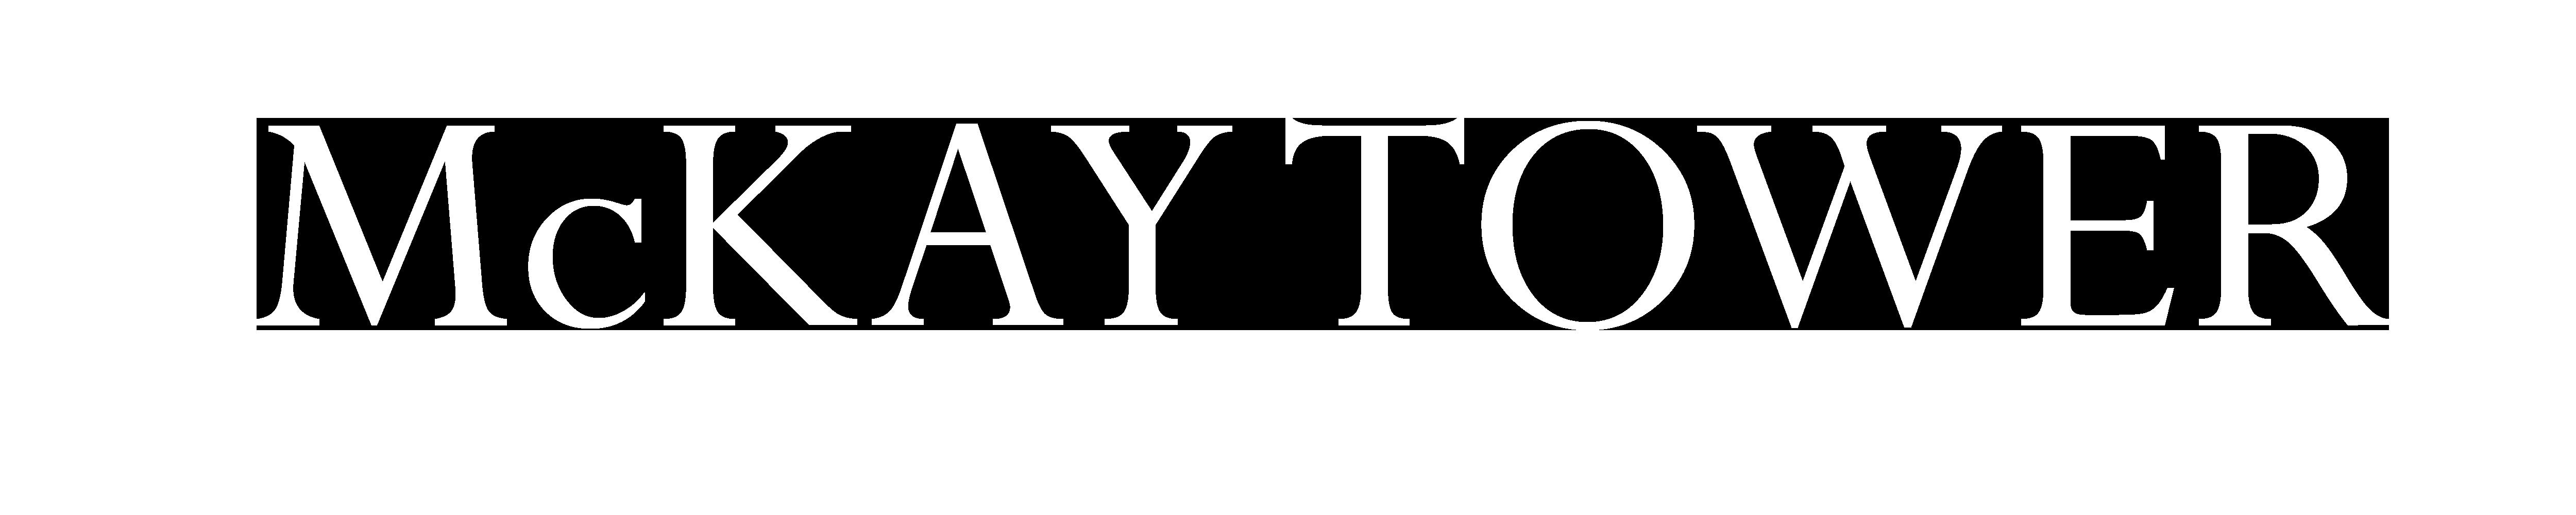 McKAY TOWER-logo